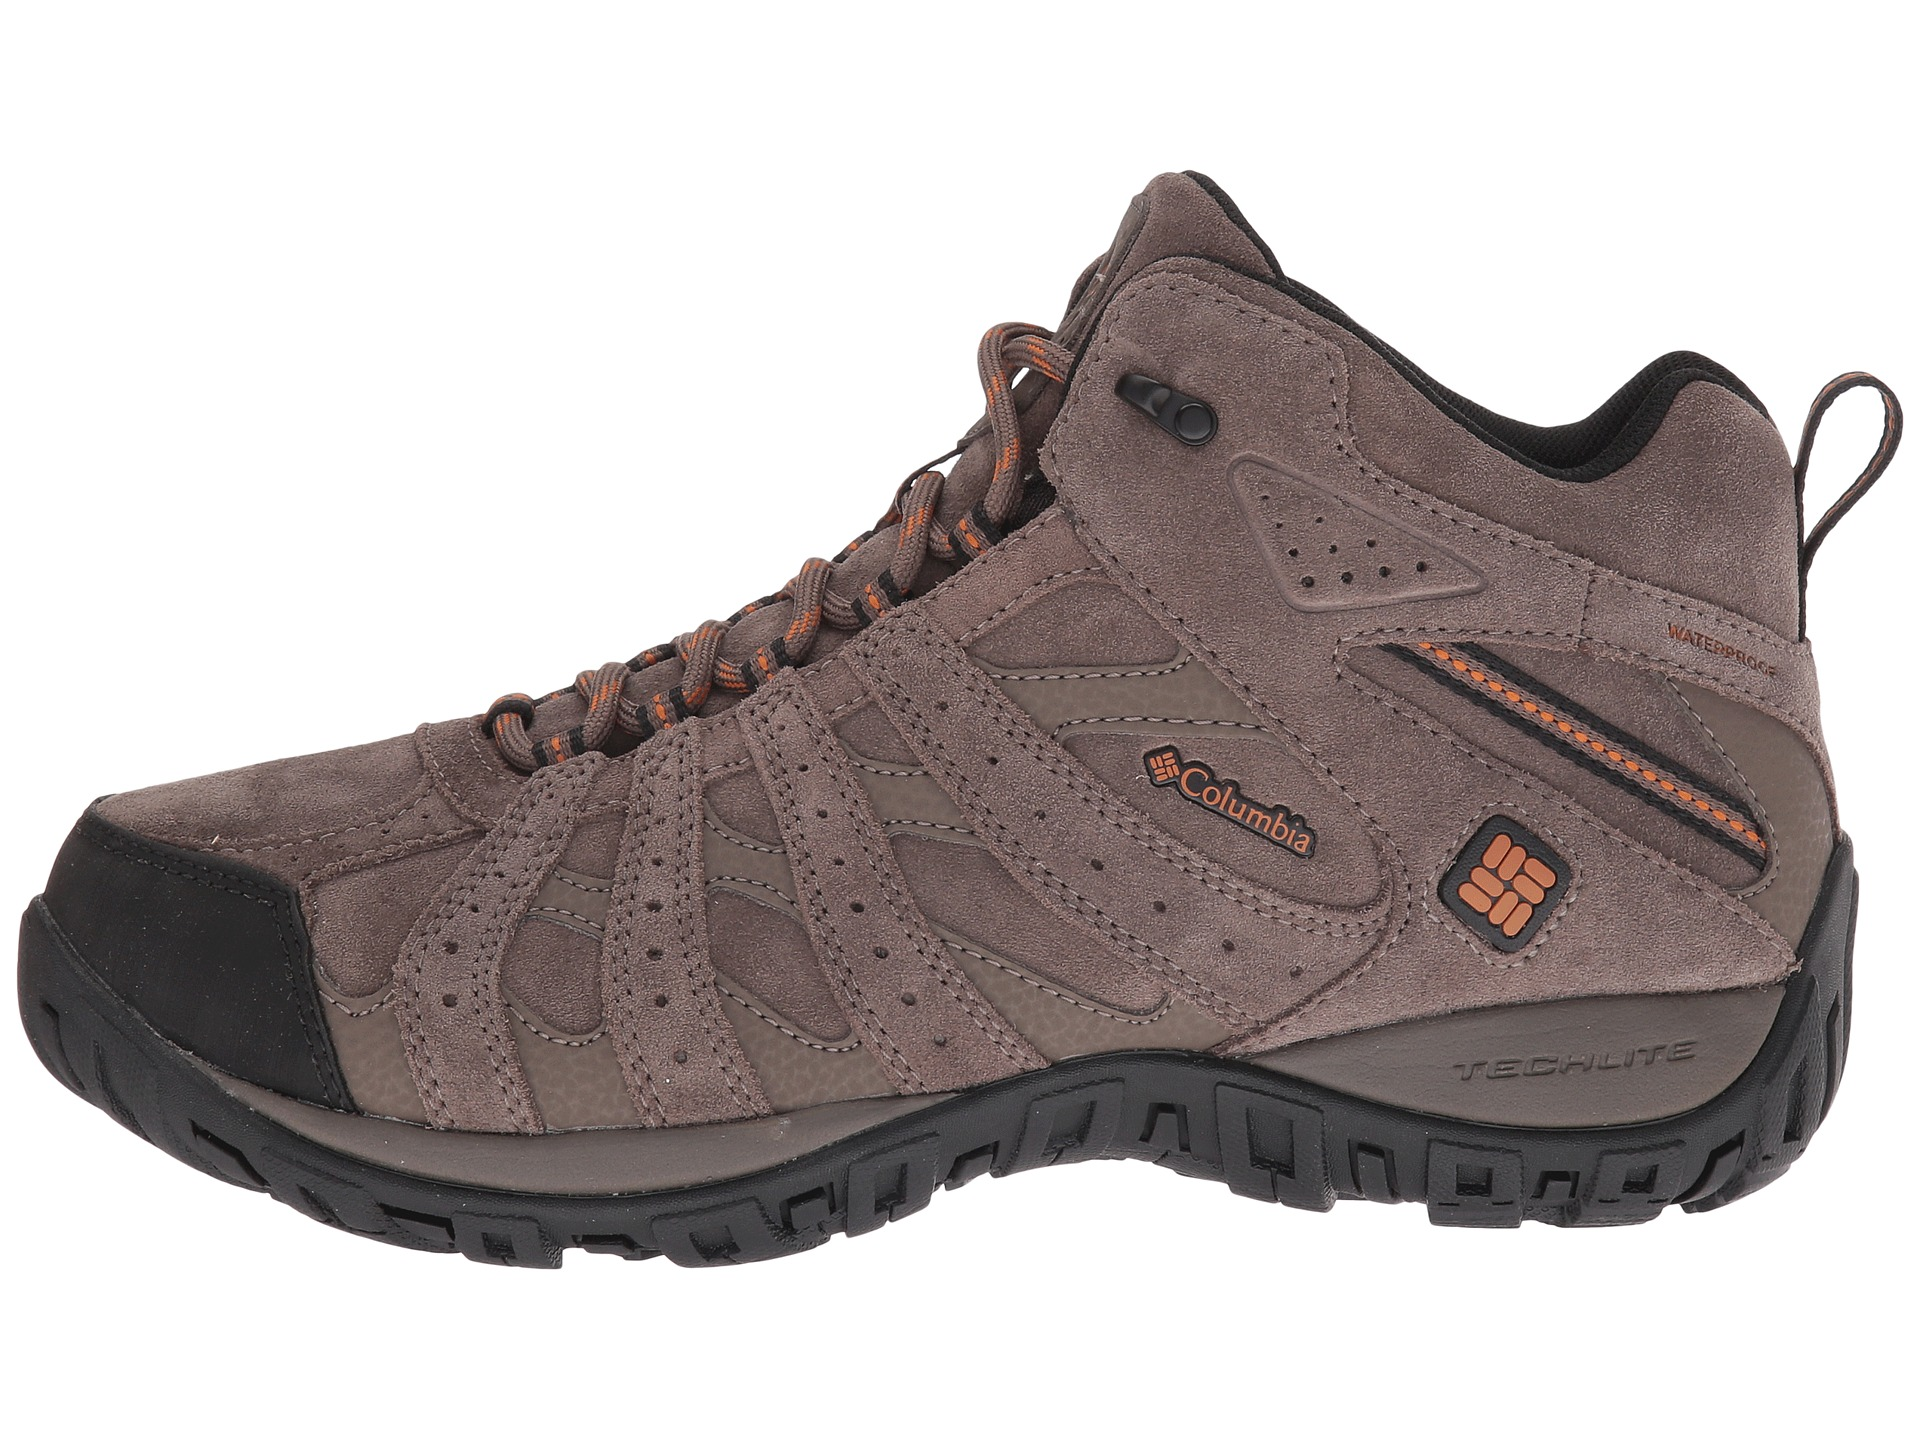 Columbia Redmond Explore Boys Waterproof Hiking Shoes Size